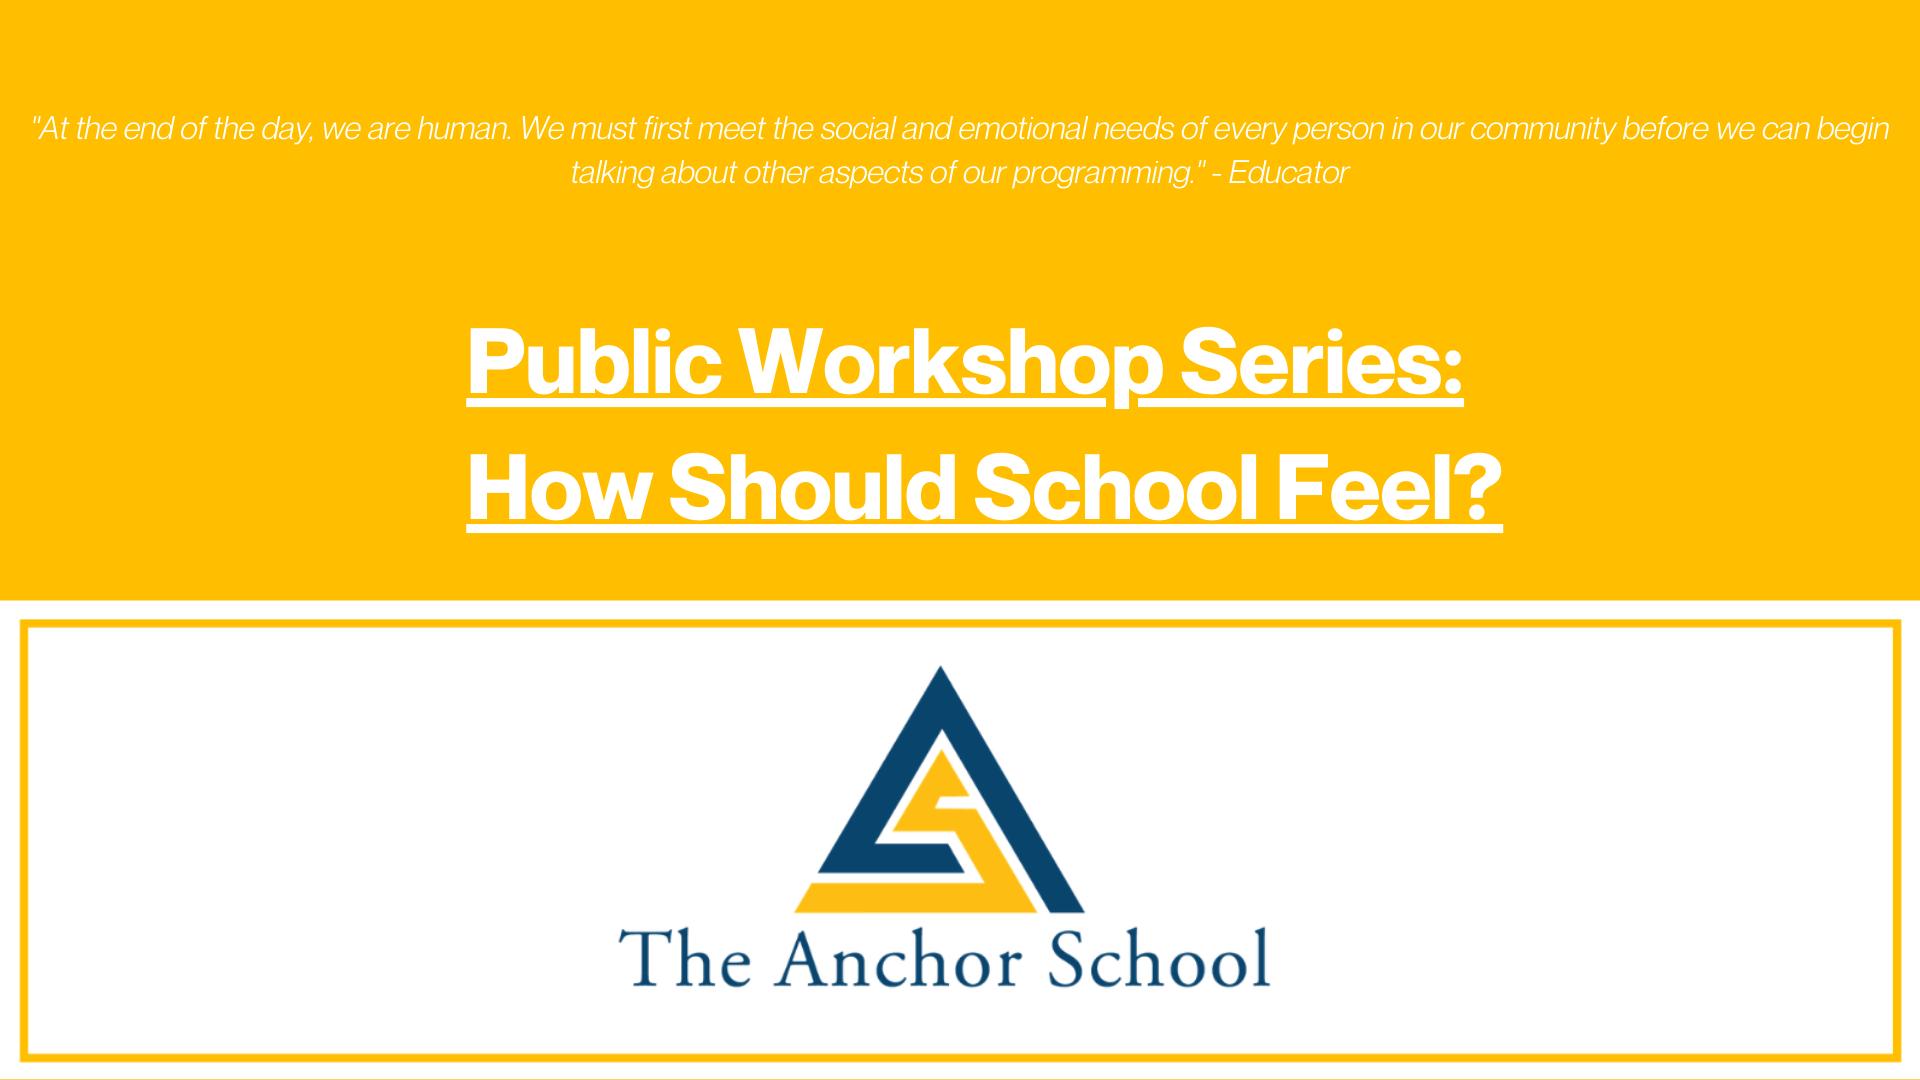 Public Workshop Series School Design The Anchor School